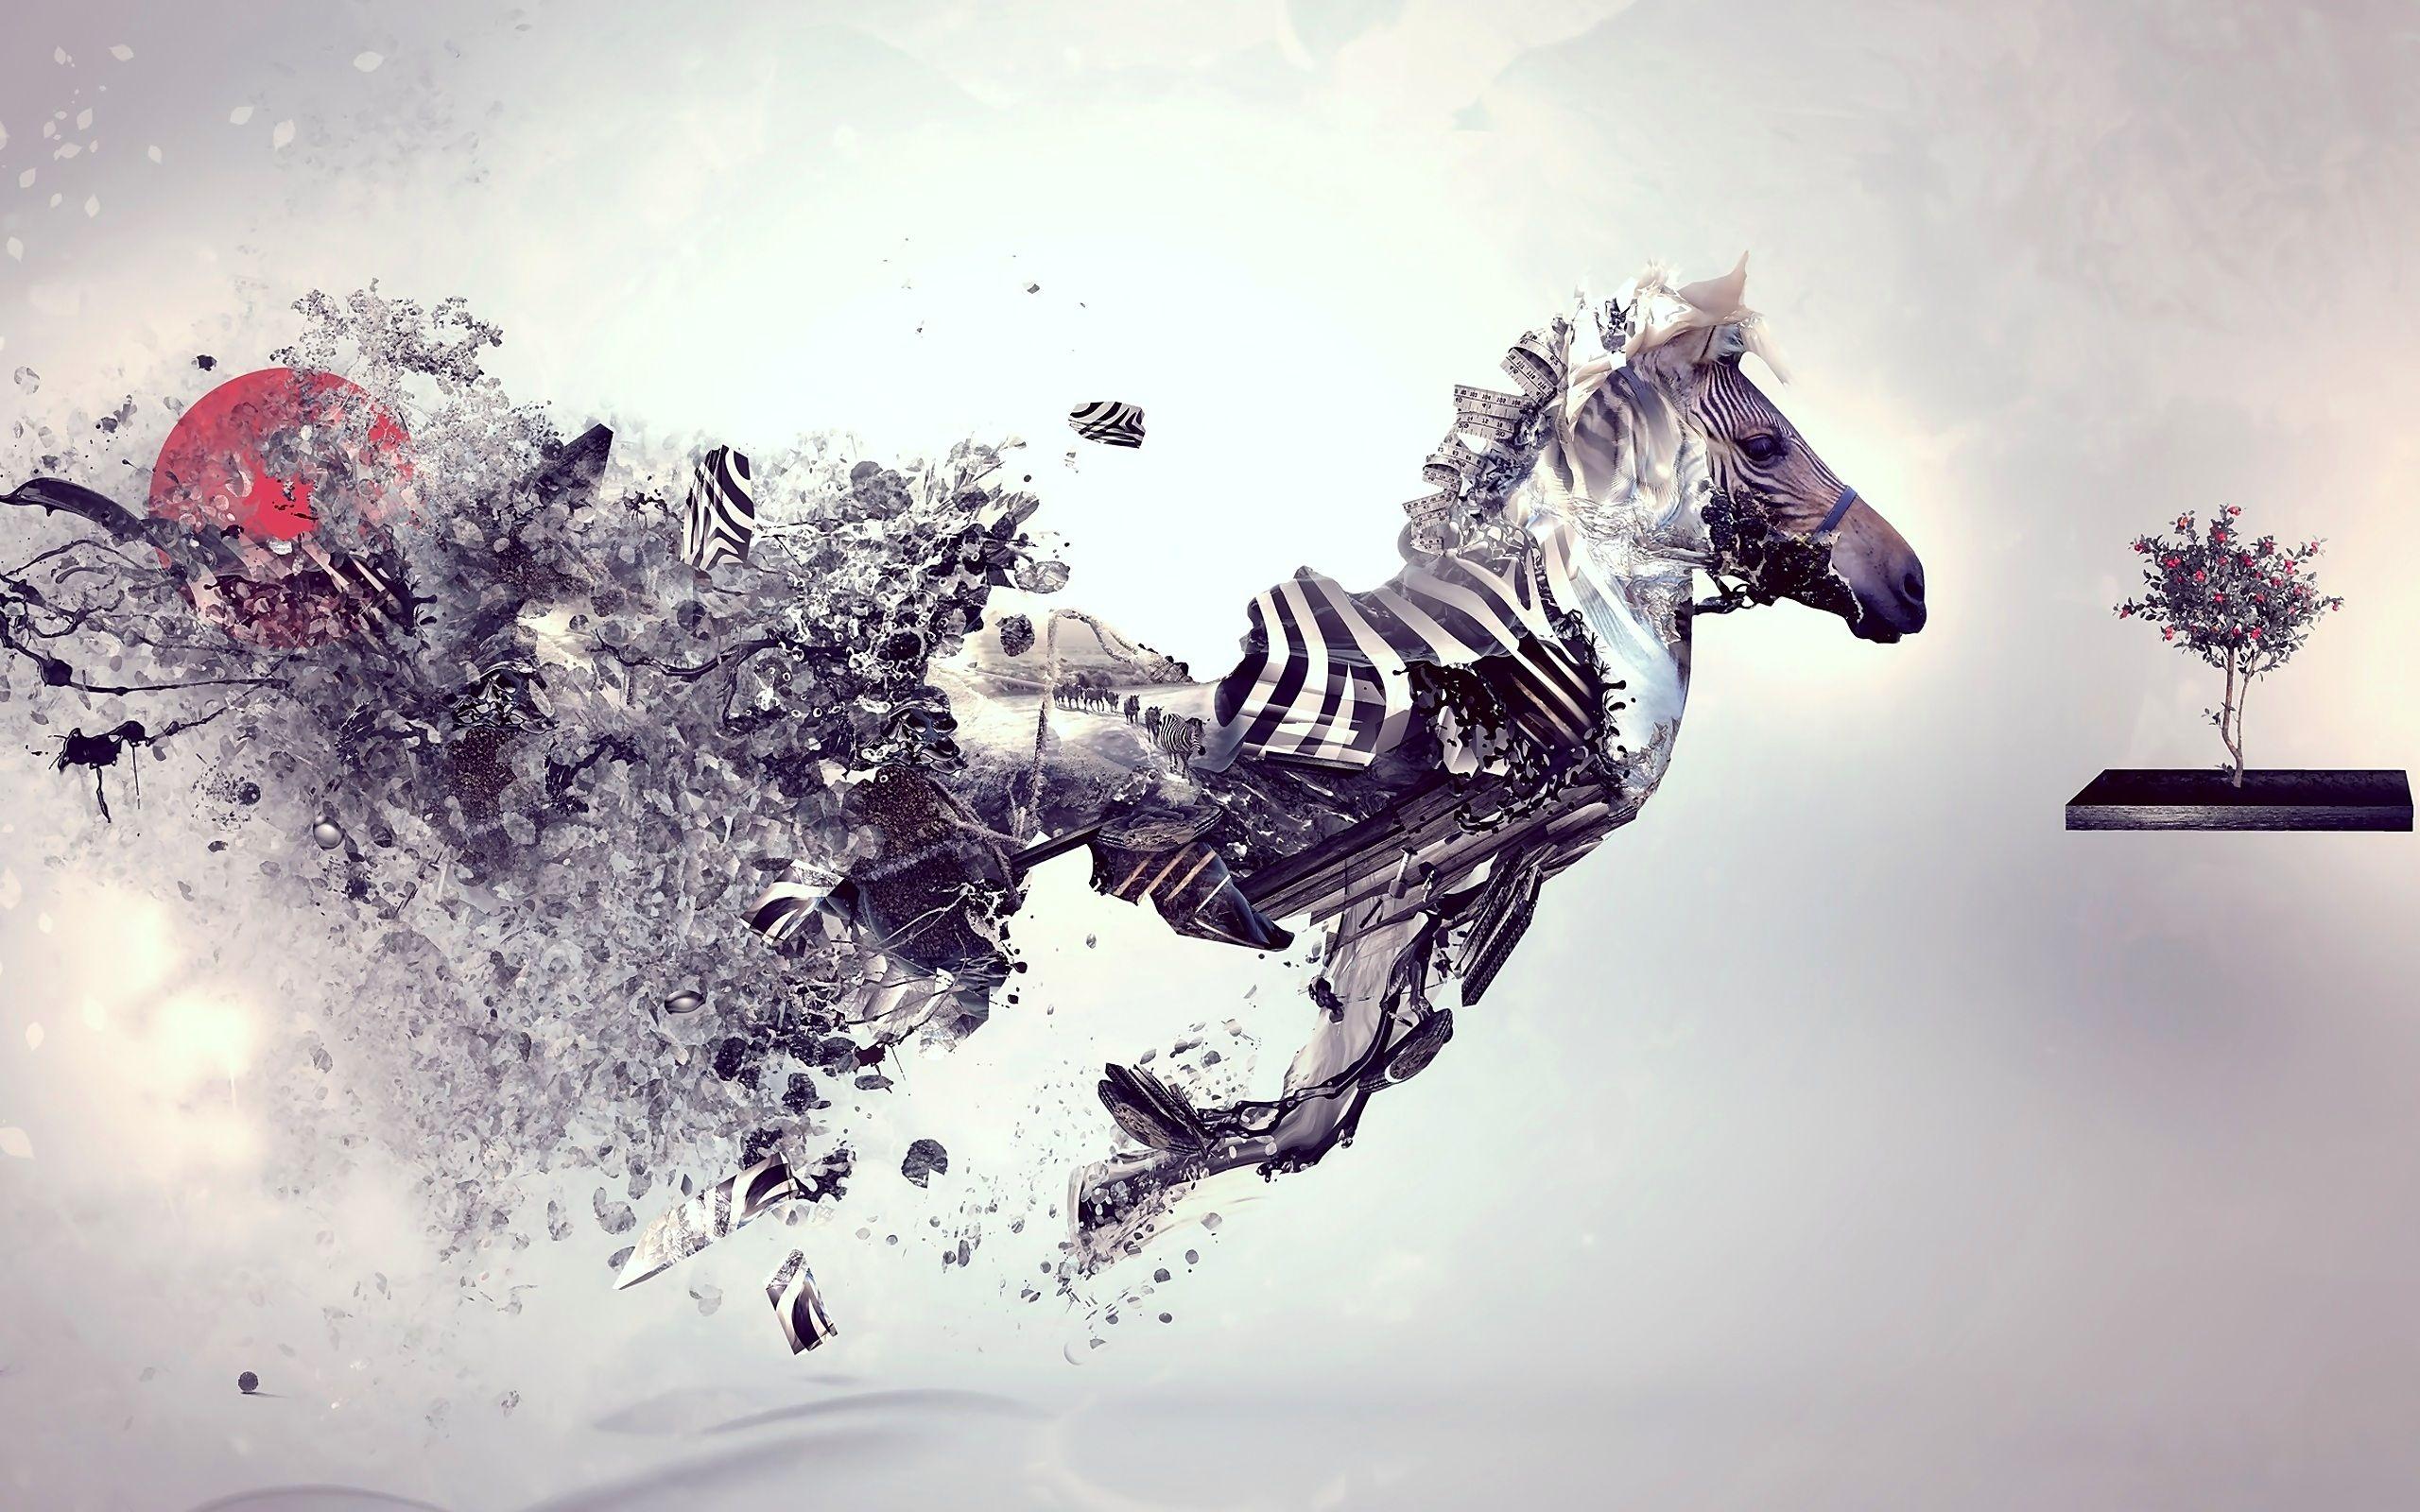 Digital Art Beautiful Zebra Free Bright Wallpapers Cool